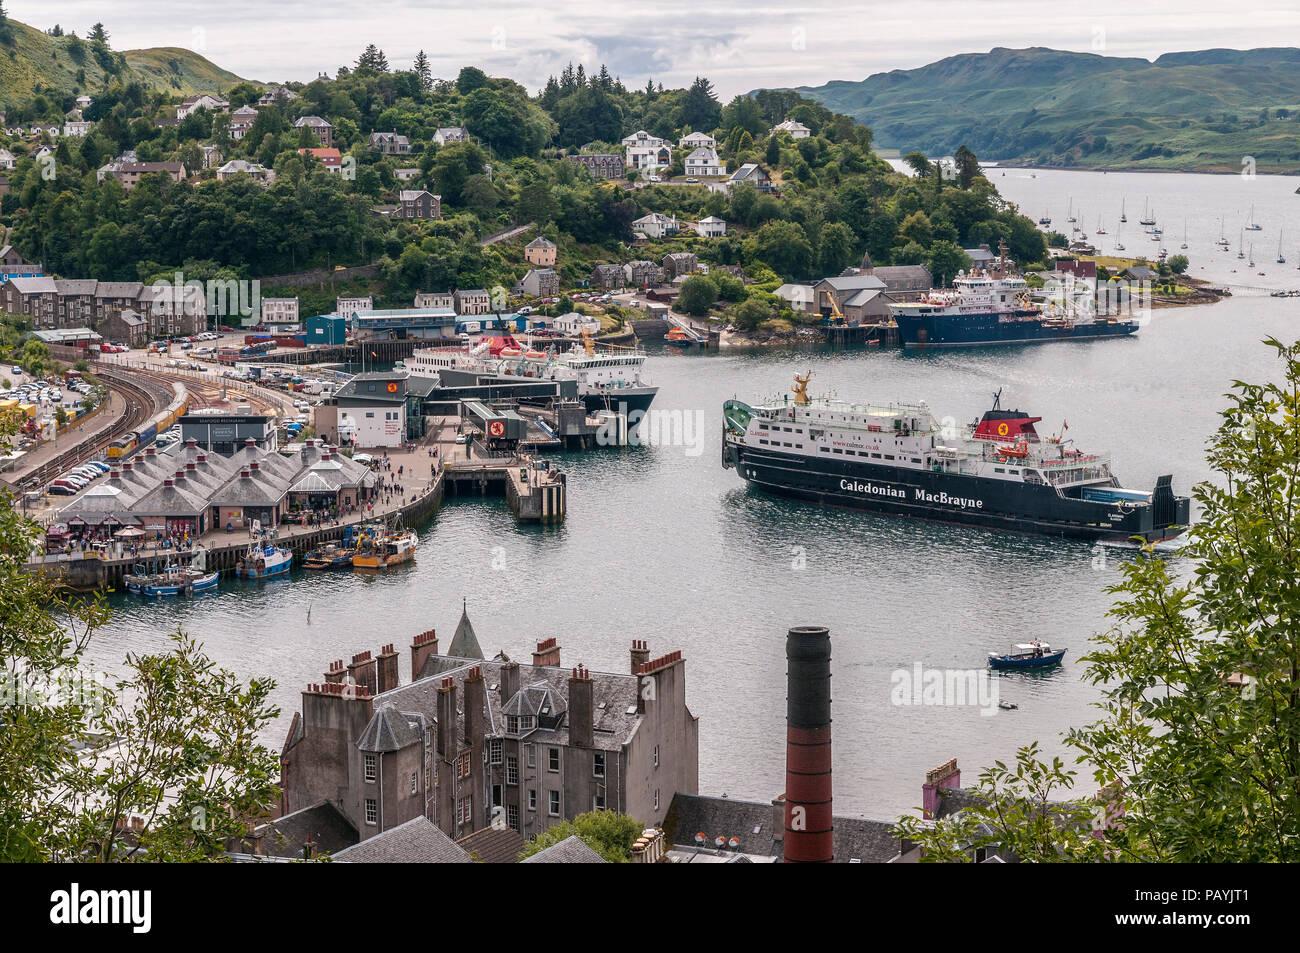 MacBrayne car ferries in Oban harbour Argyll. Scotland. Stock Photo